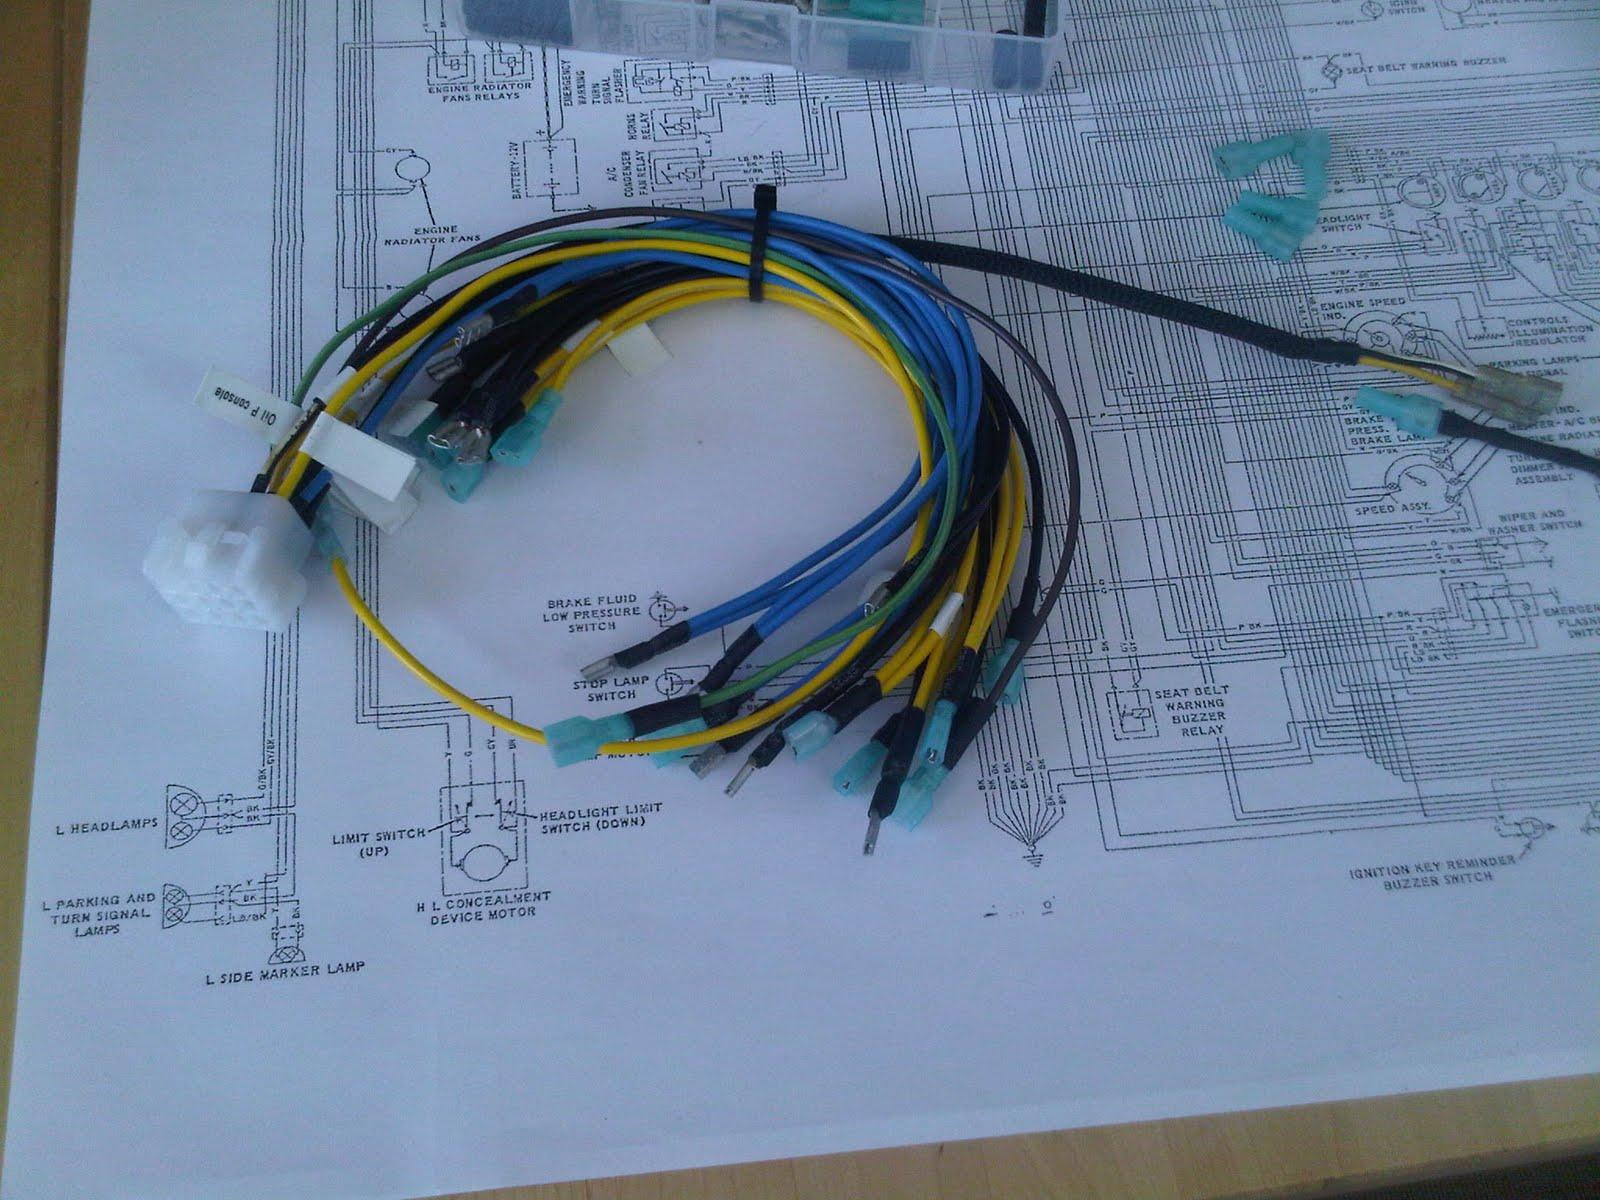 detomaso pantera wiring diagram wire data schema u2022 arctic cat snowmobile belt chart 1998 550 [ 1600 x 1200 Pixel ]